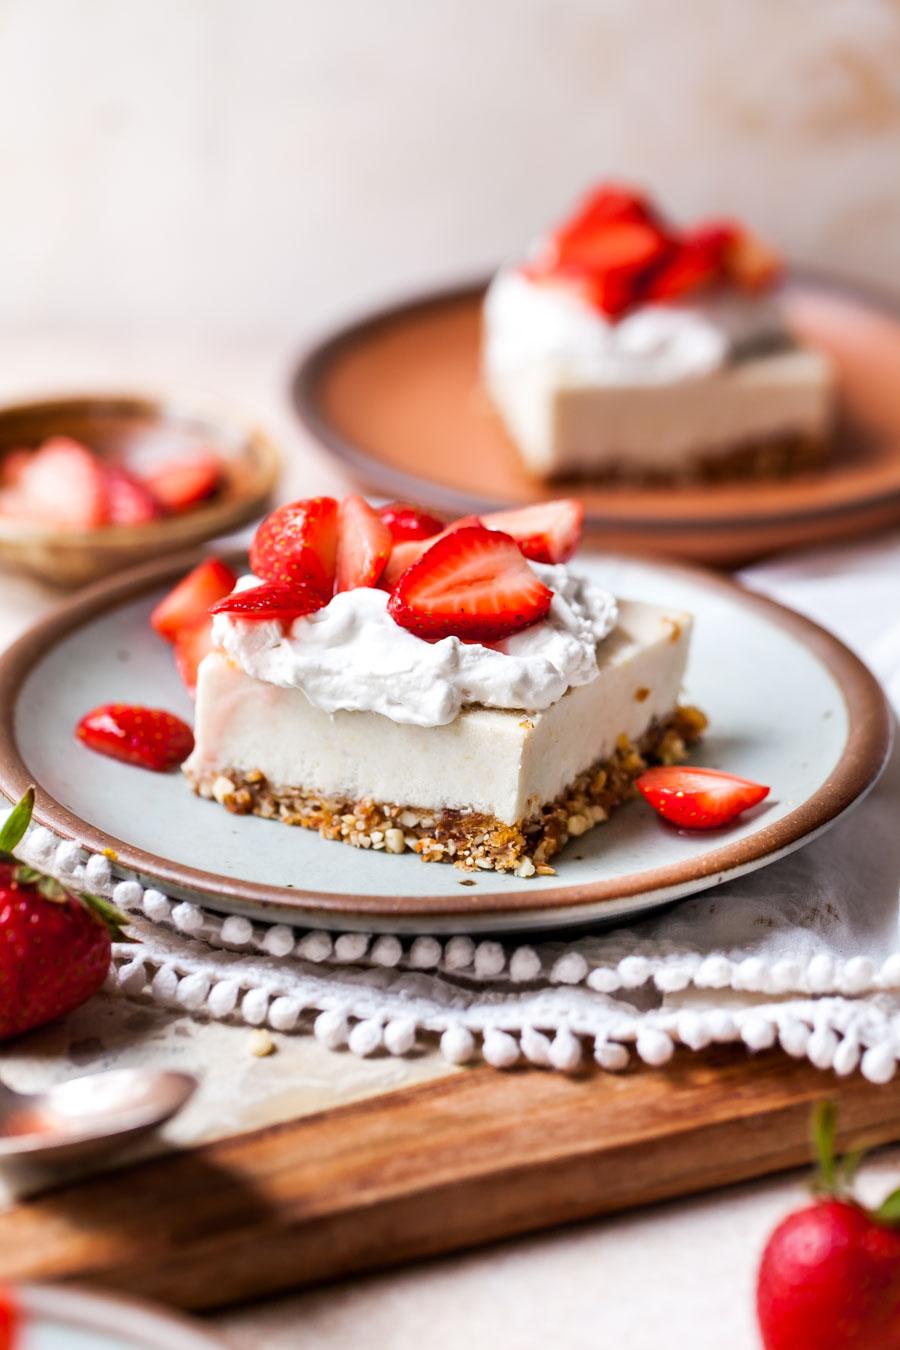 Dairy-free cheesecake bar with strawberries